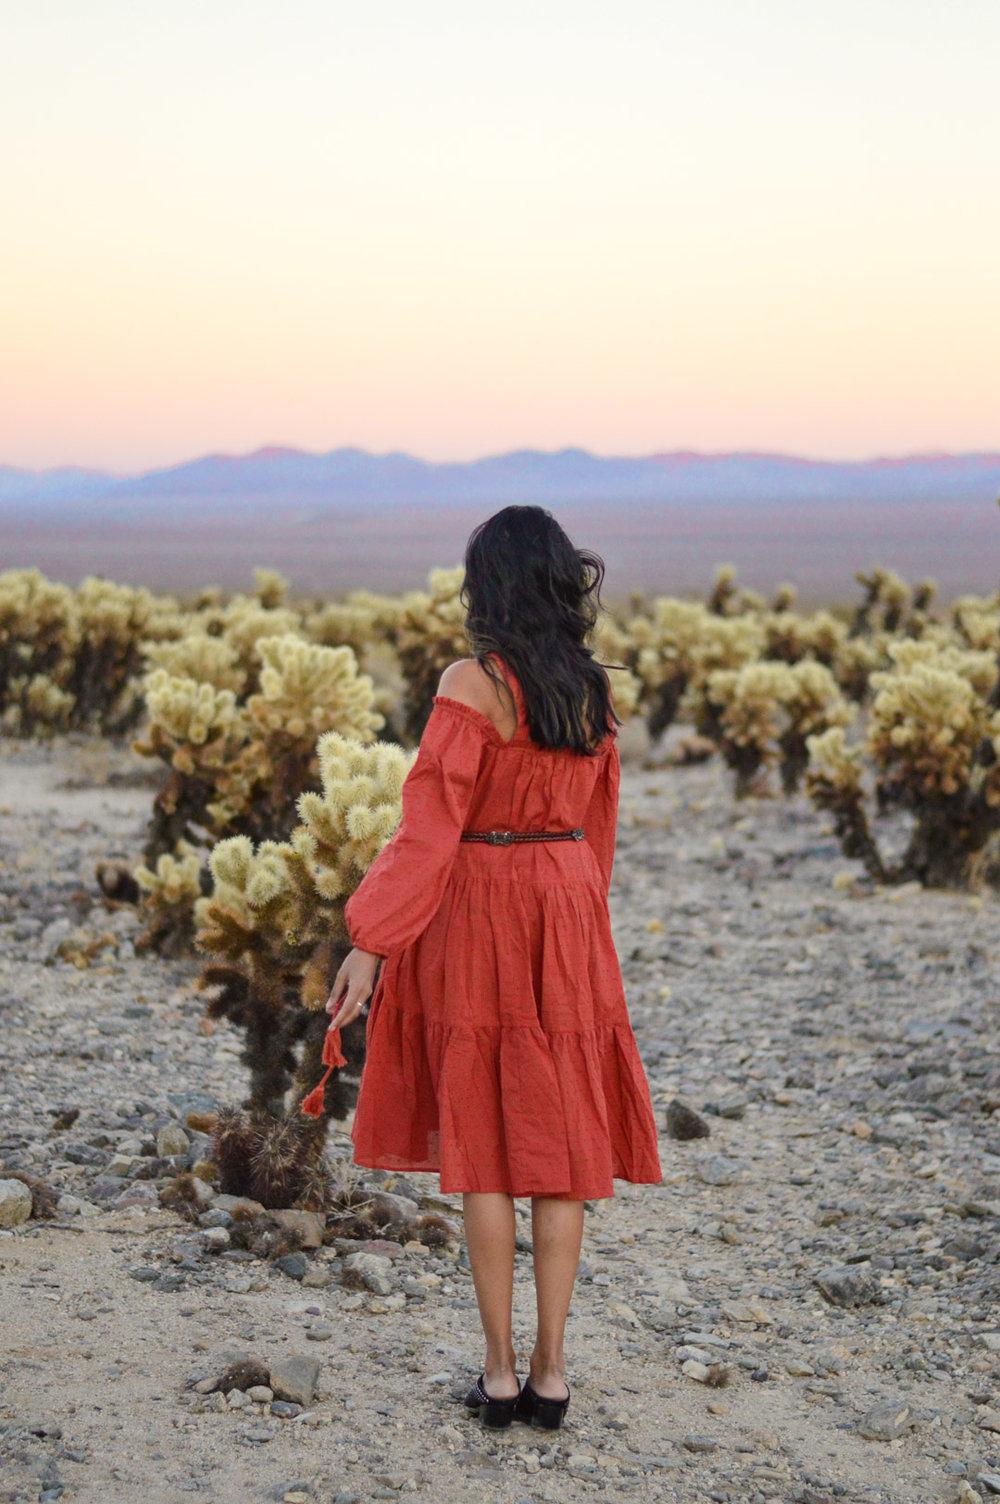 cholla-cactus-garden-joshua-tree-travel-itinerary-fashion-blogger-boho-style 9